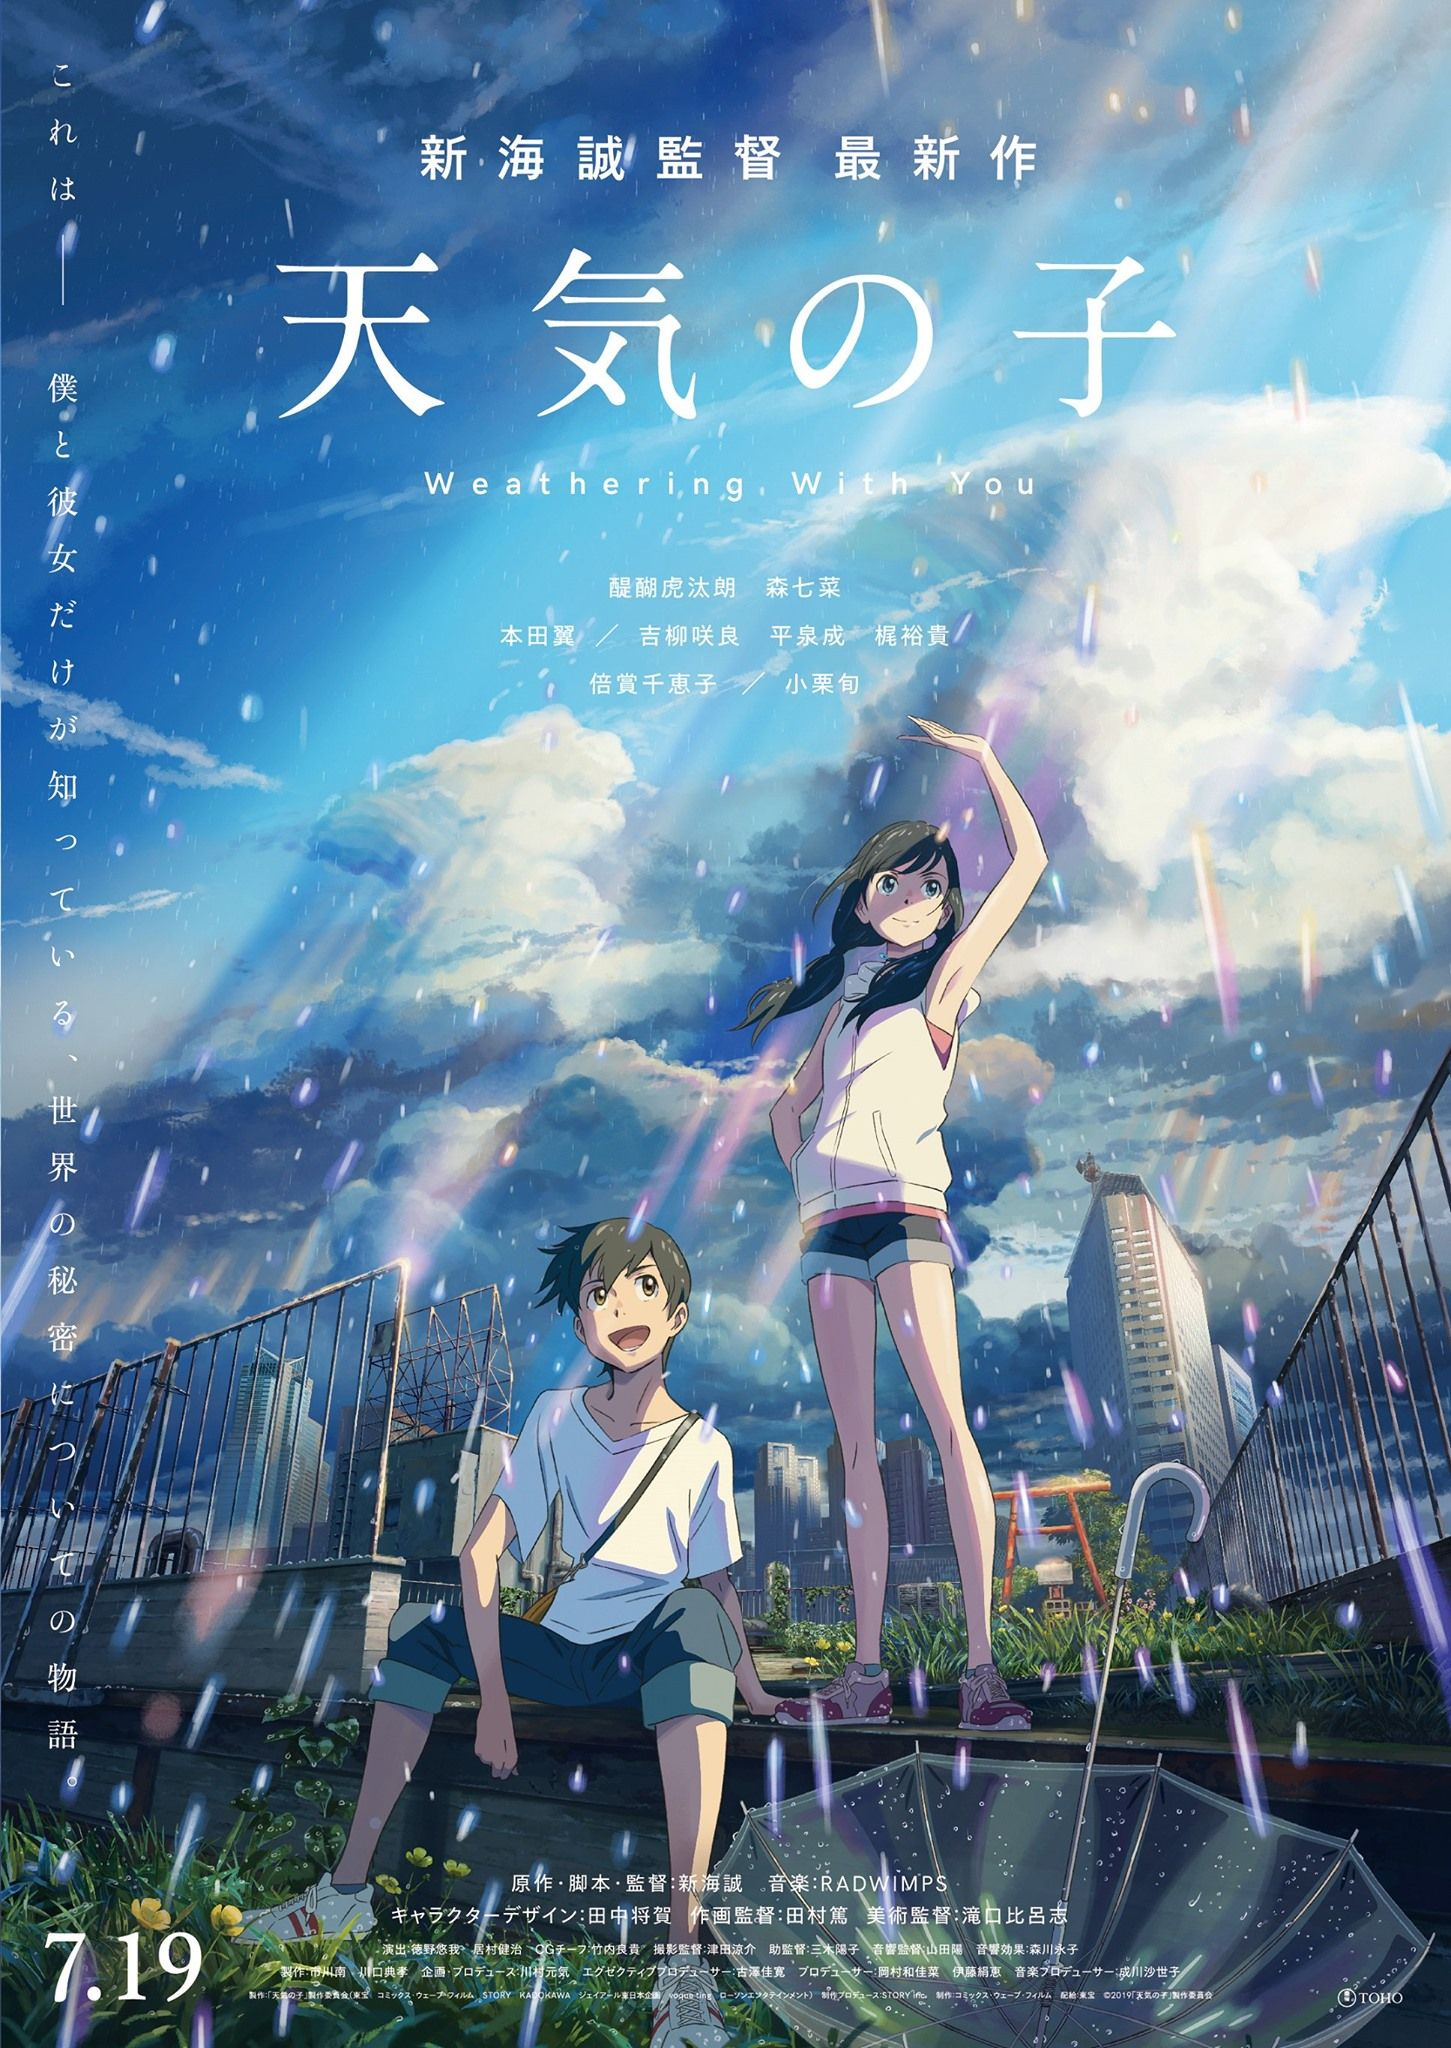 Tenki no Ko (Weathering With You) la nueva película de Makoto Shinkai – Sombras de Rebe… | Peliculas japonesas anime, Películas de anime, Mejores peliculas de anime